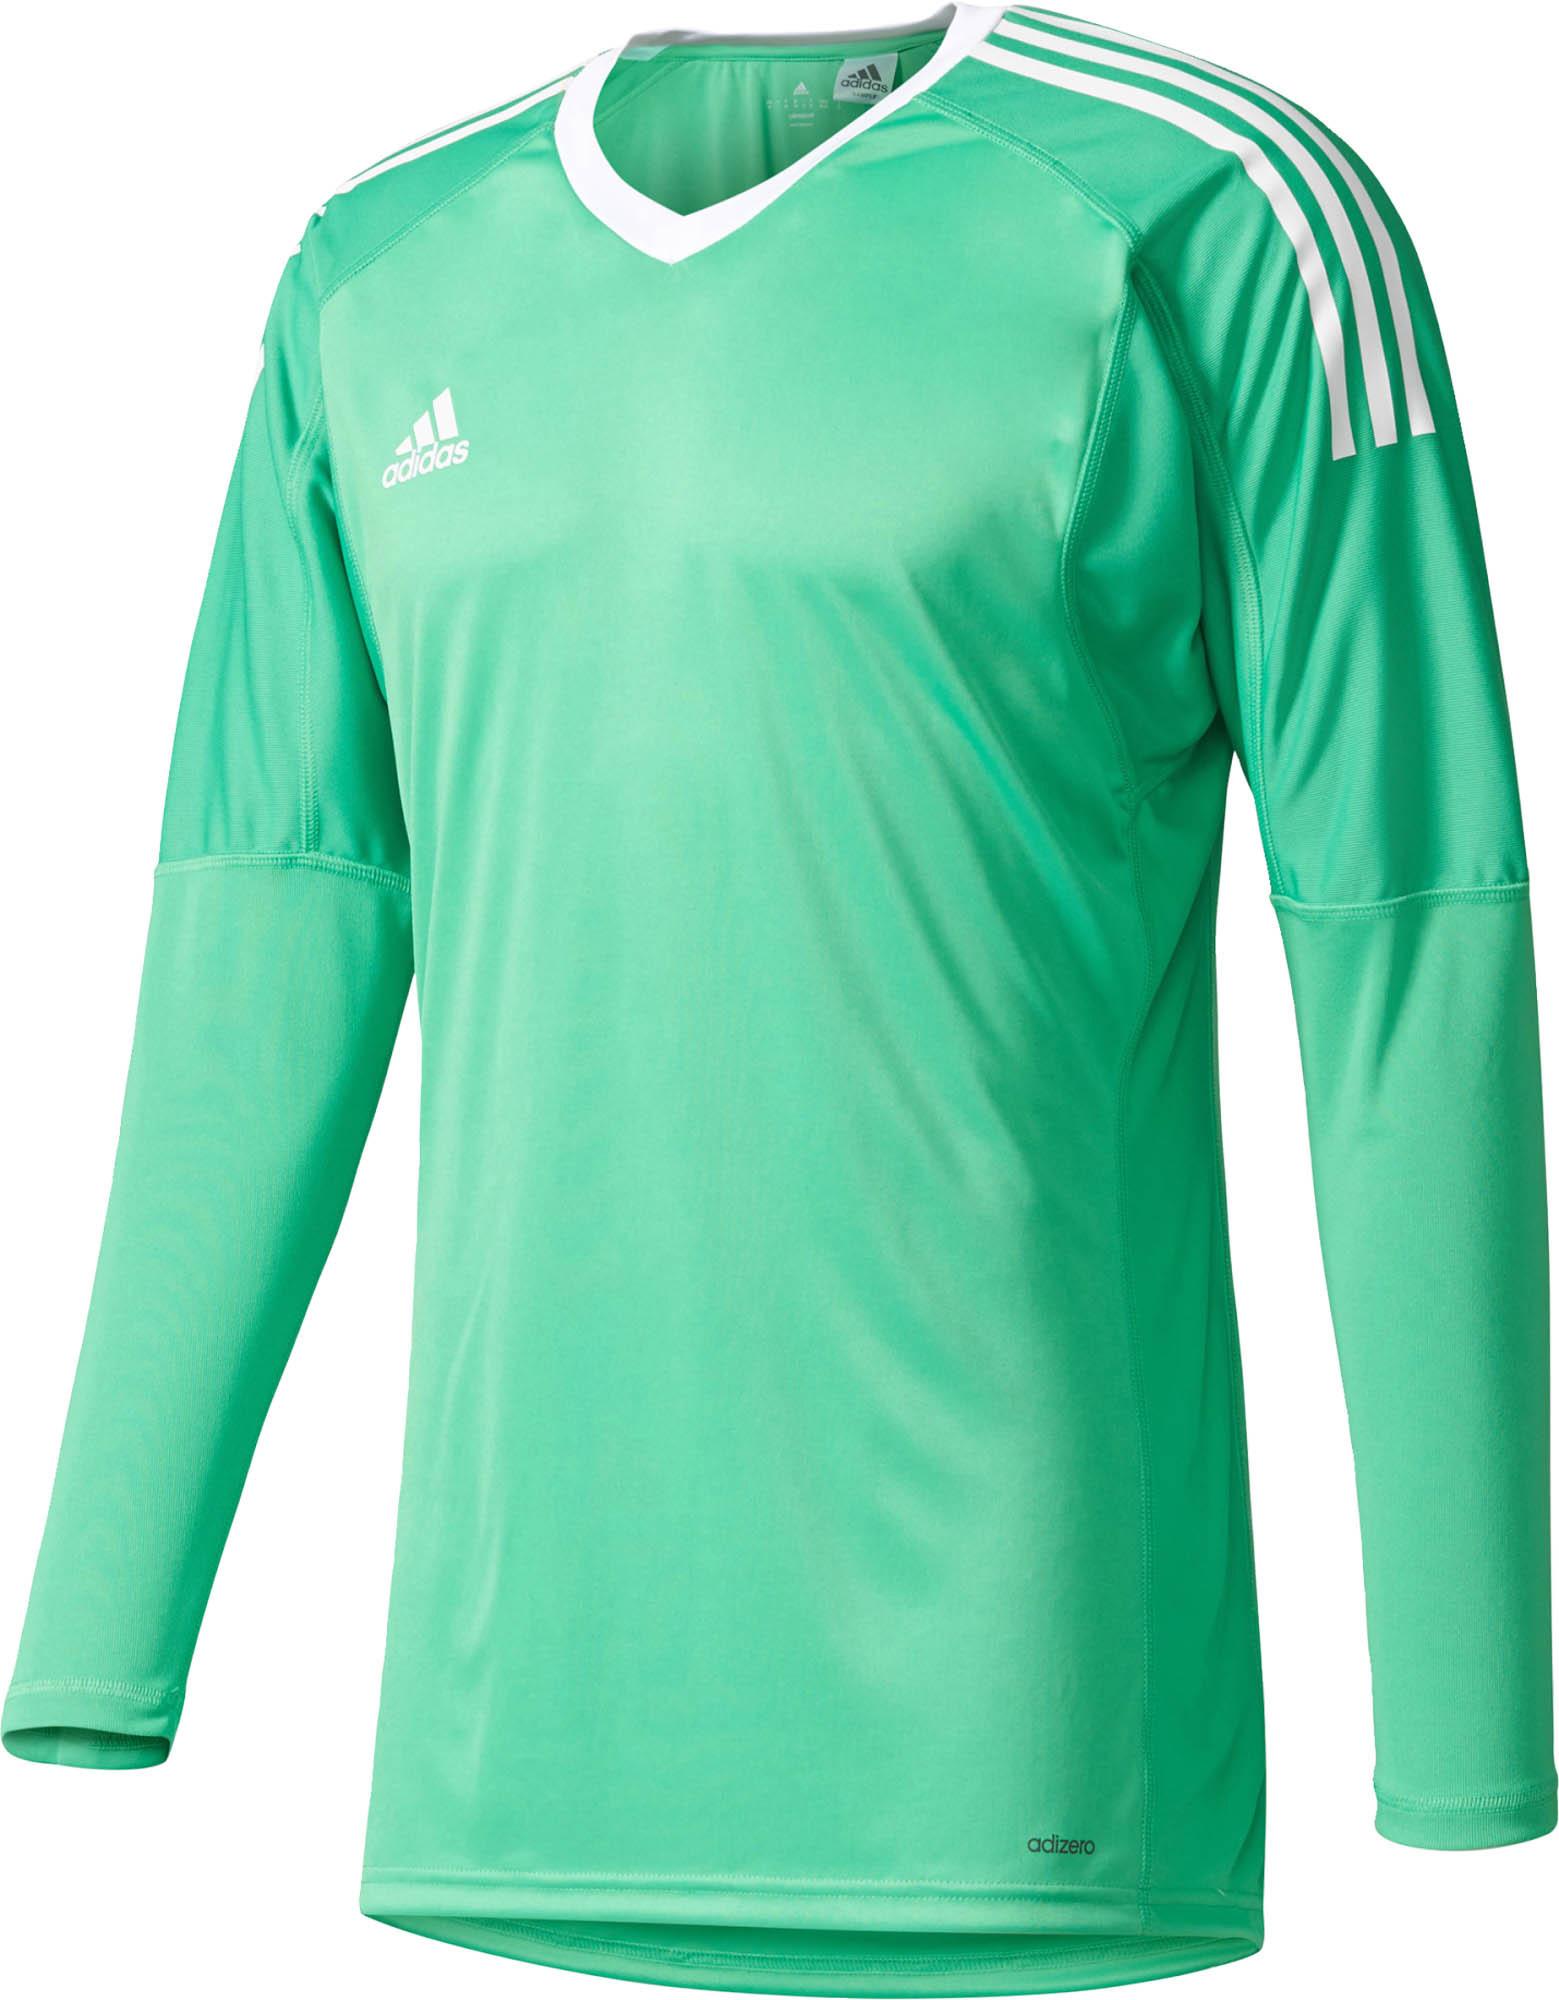 142cbfbba adidas Revigo 17 Goalkeeper Jersey – Energy Green/White